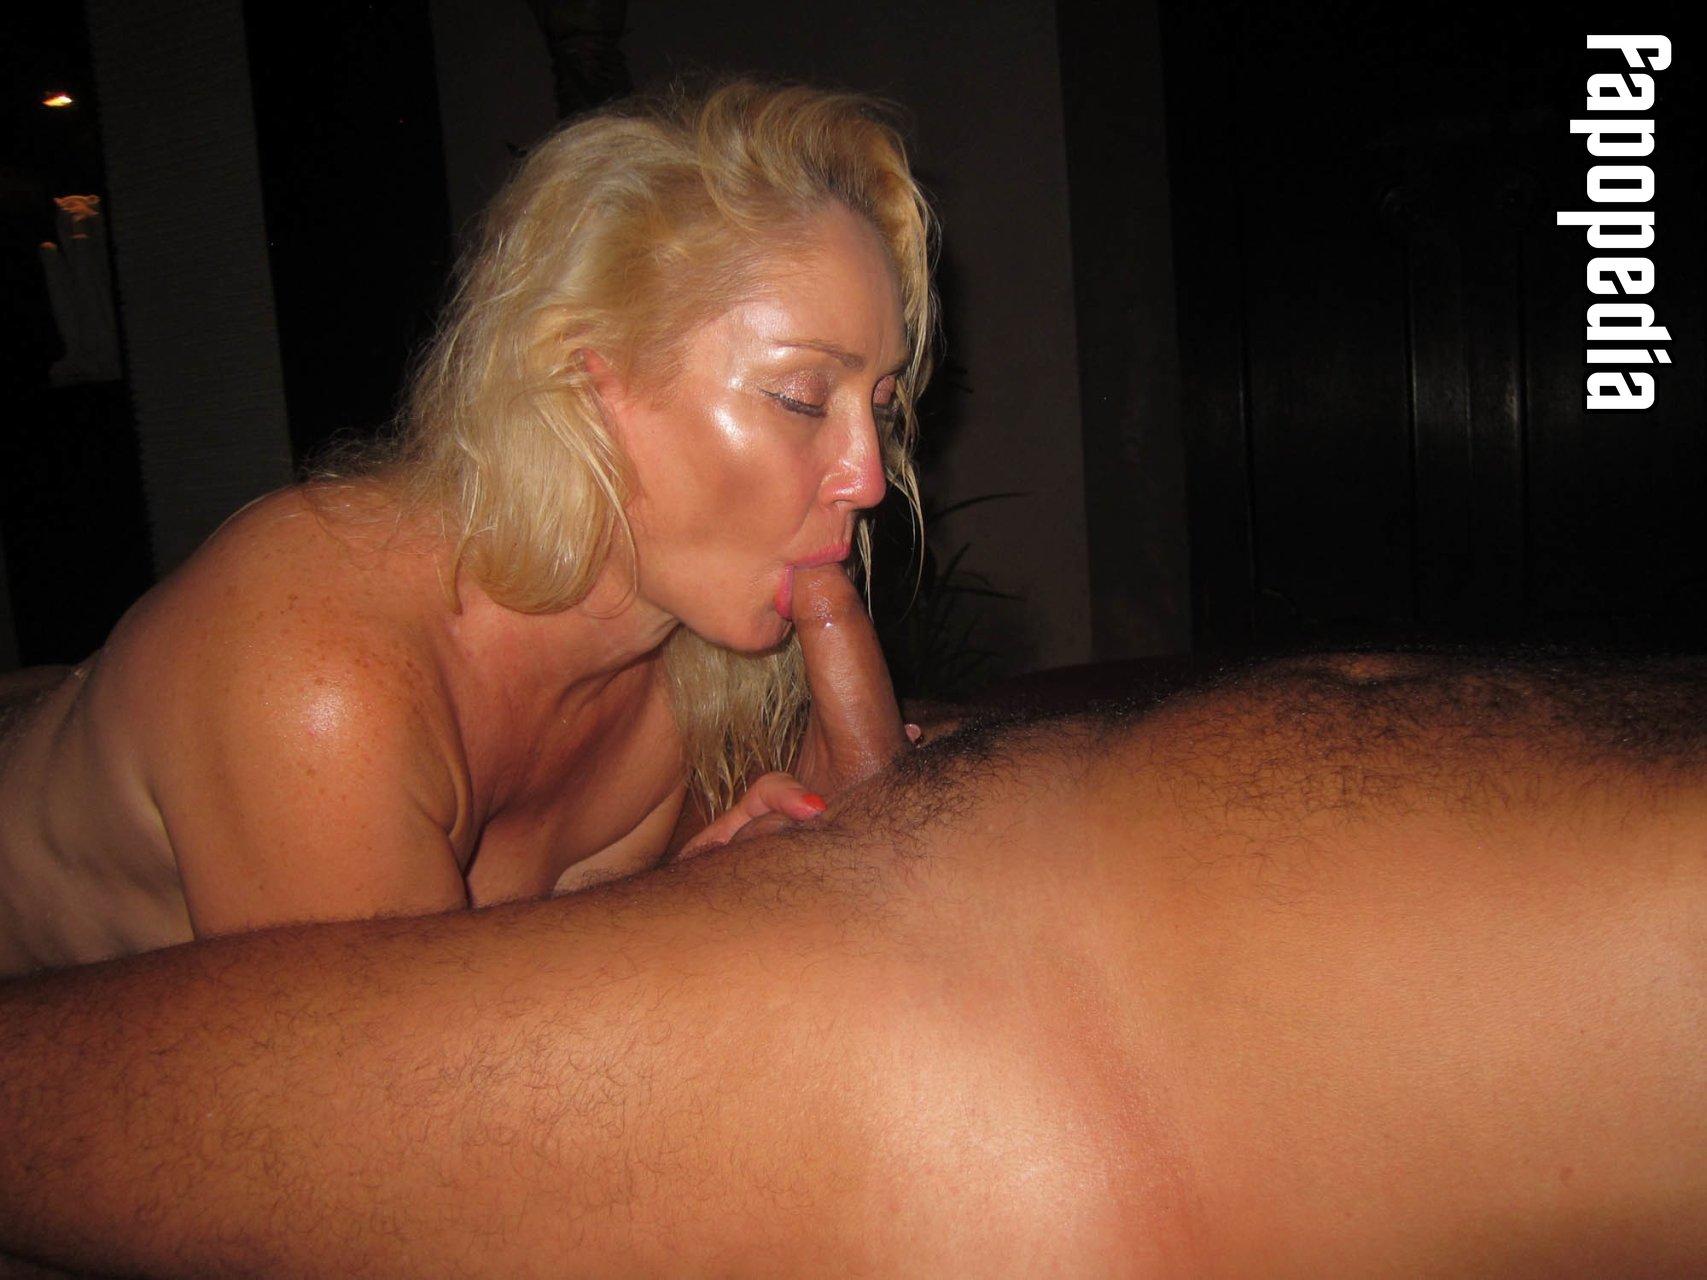 Aussie_suzy Nude Leaks